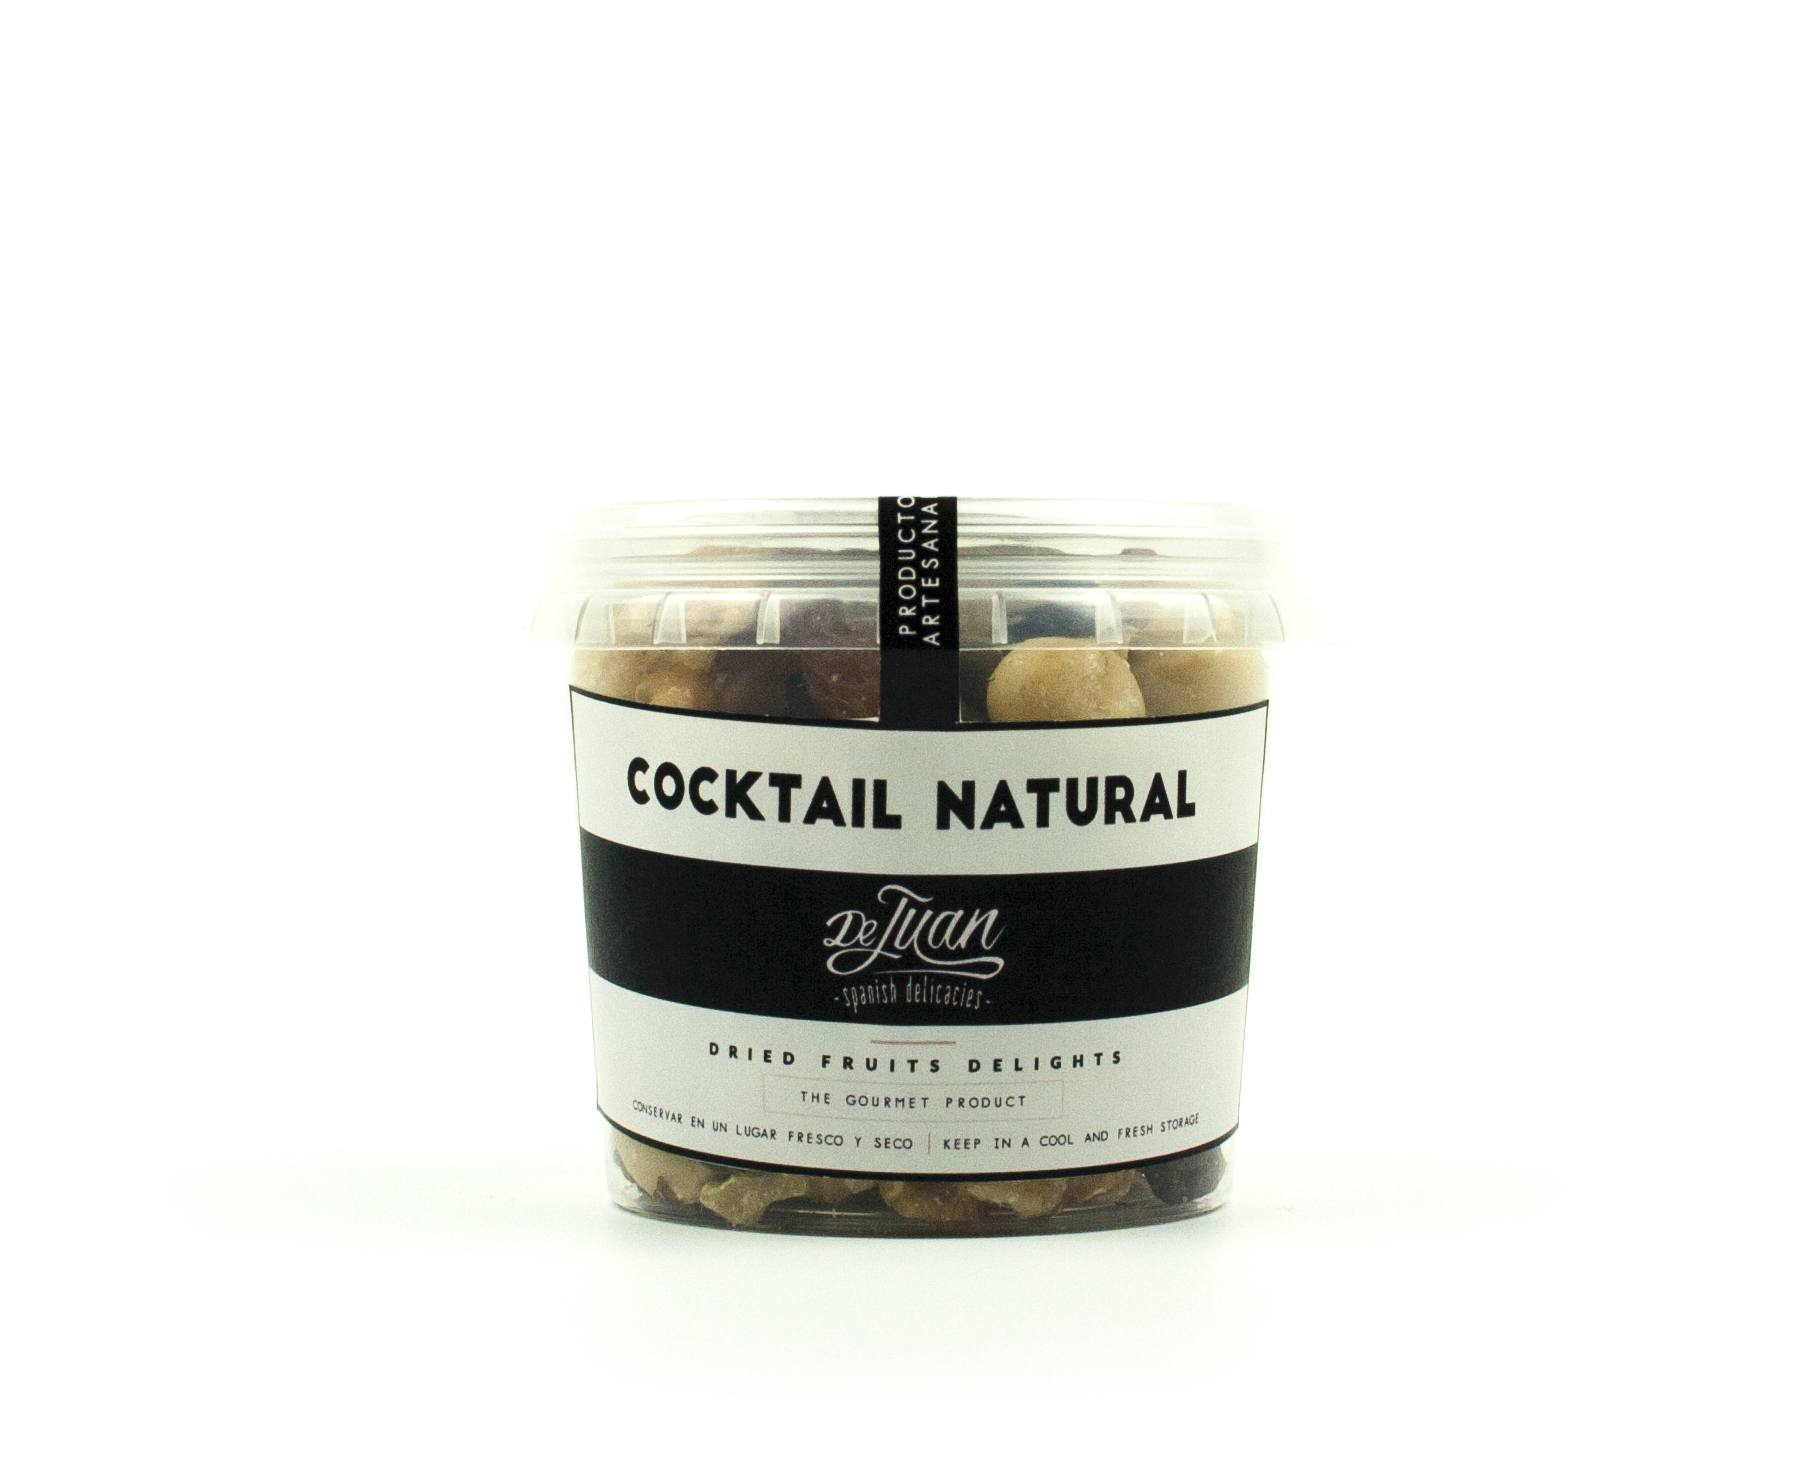 Cocktail Natural